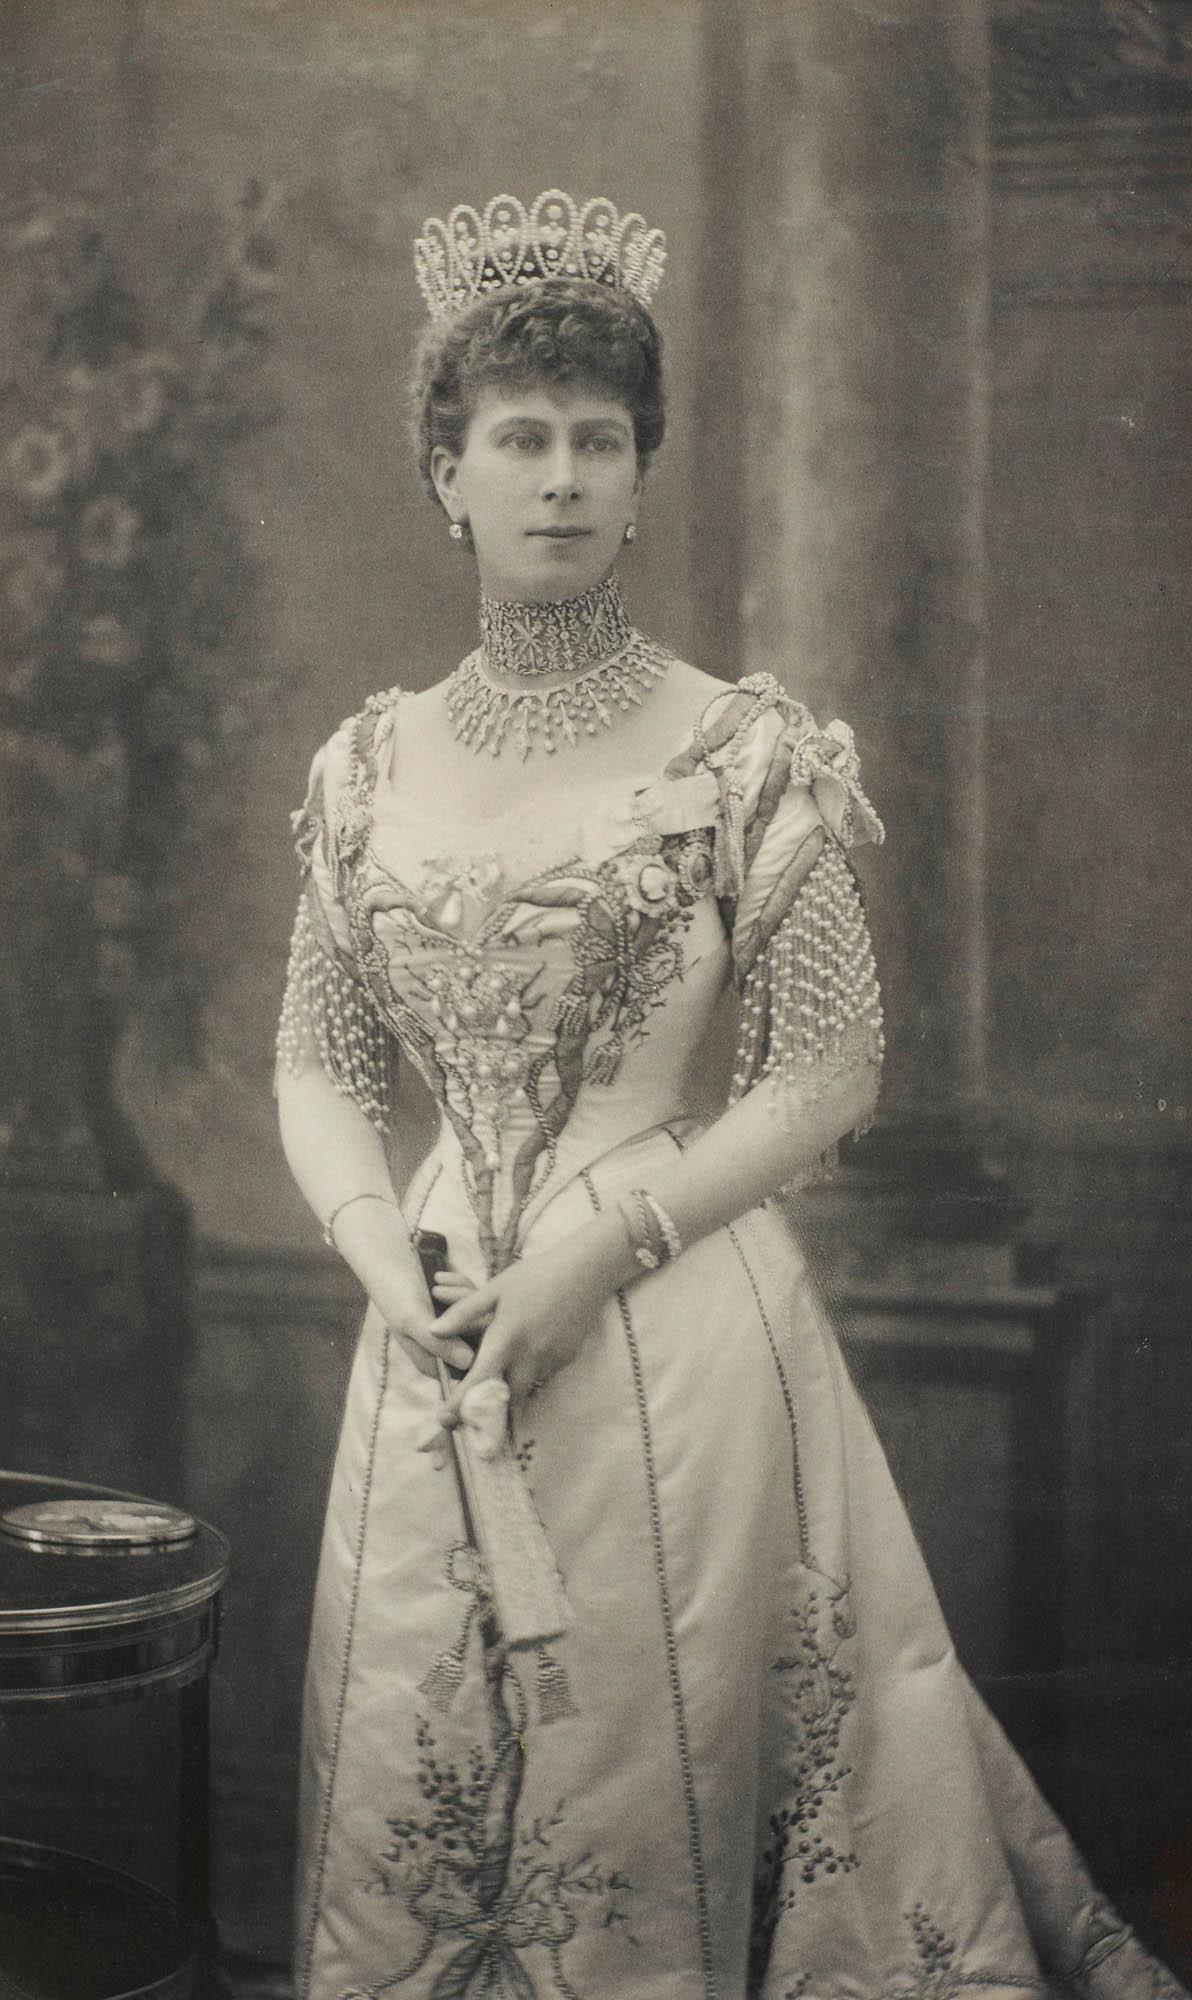 W. & D. Downey, Queen Mary draagt Loop tiara van Boucheron, foto, 1905, portret, waaier, halssieraad, armbanden